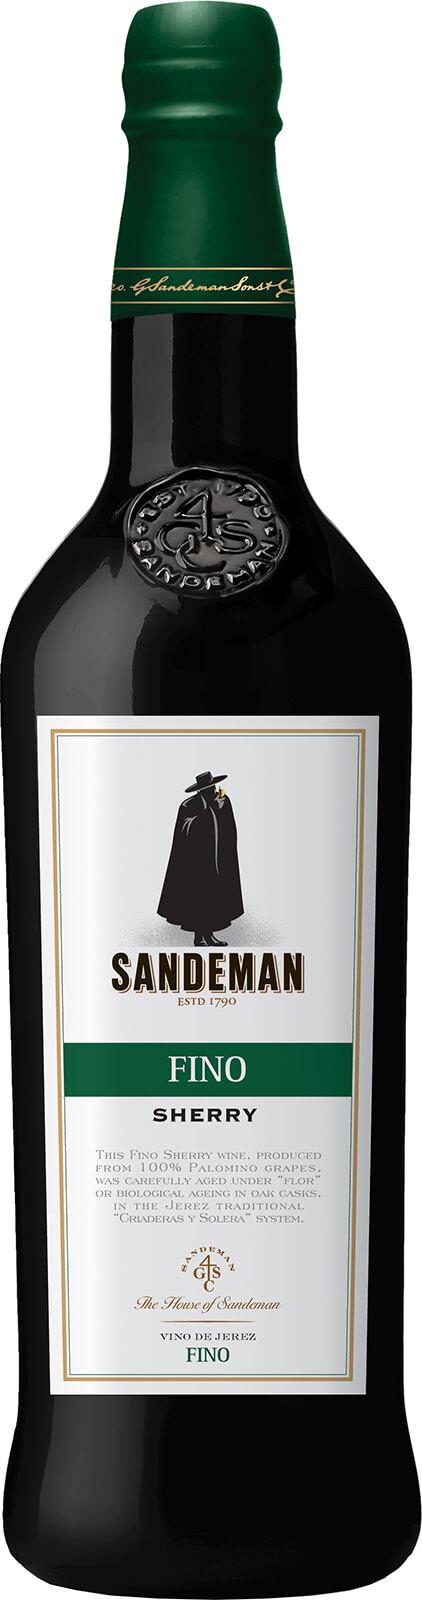 Sandeman Sherry Fino